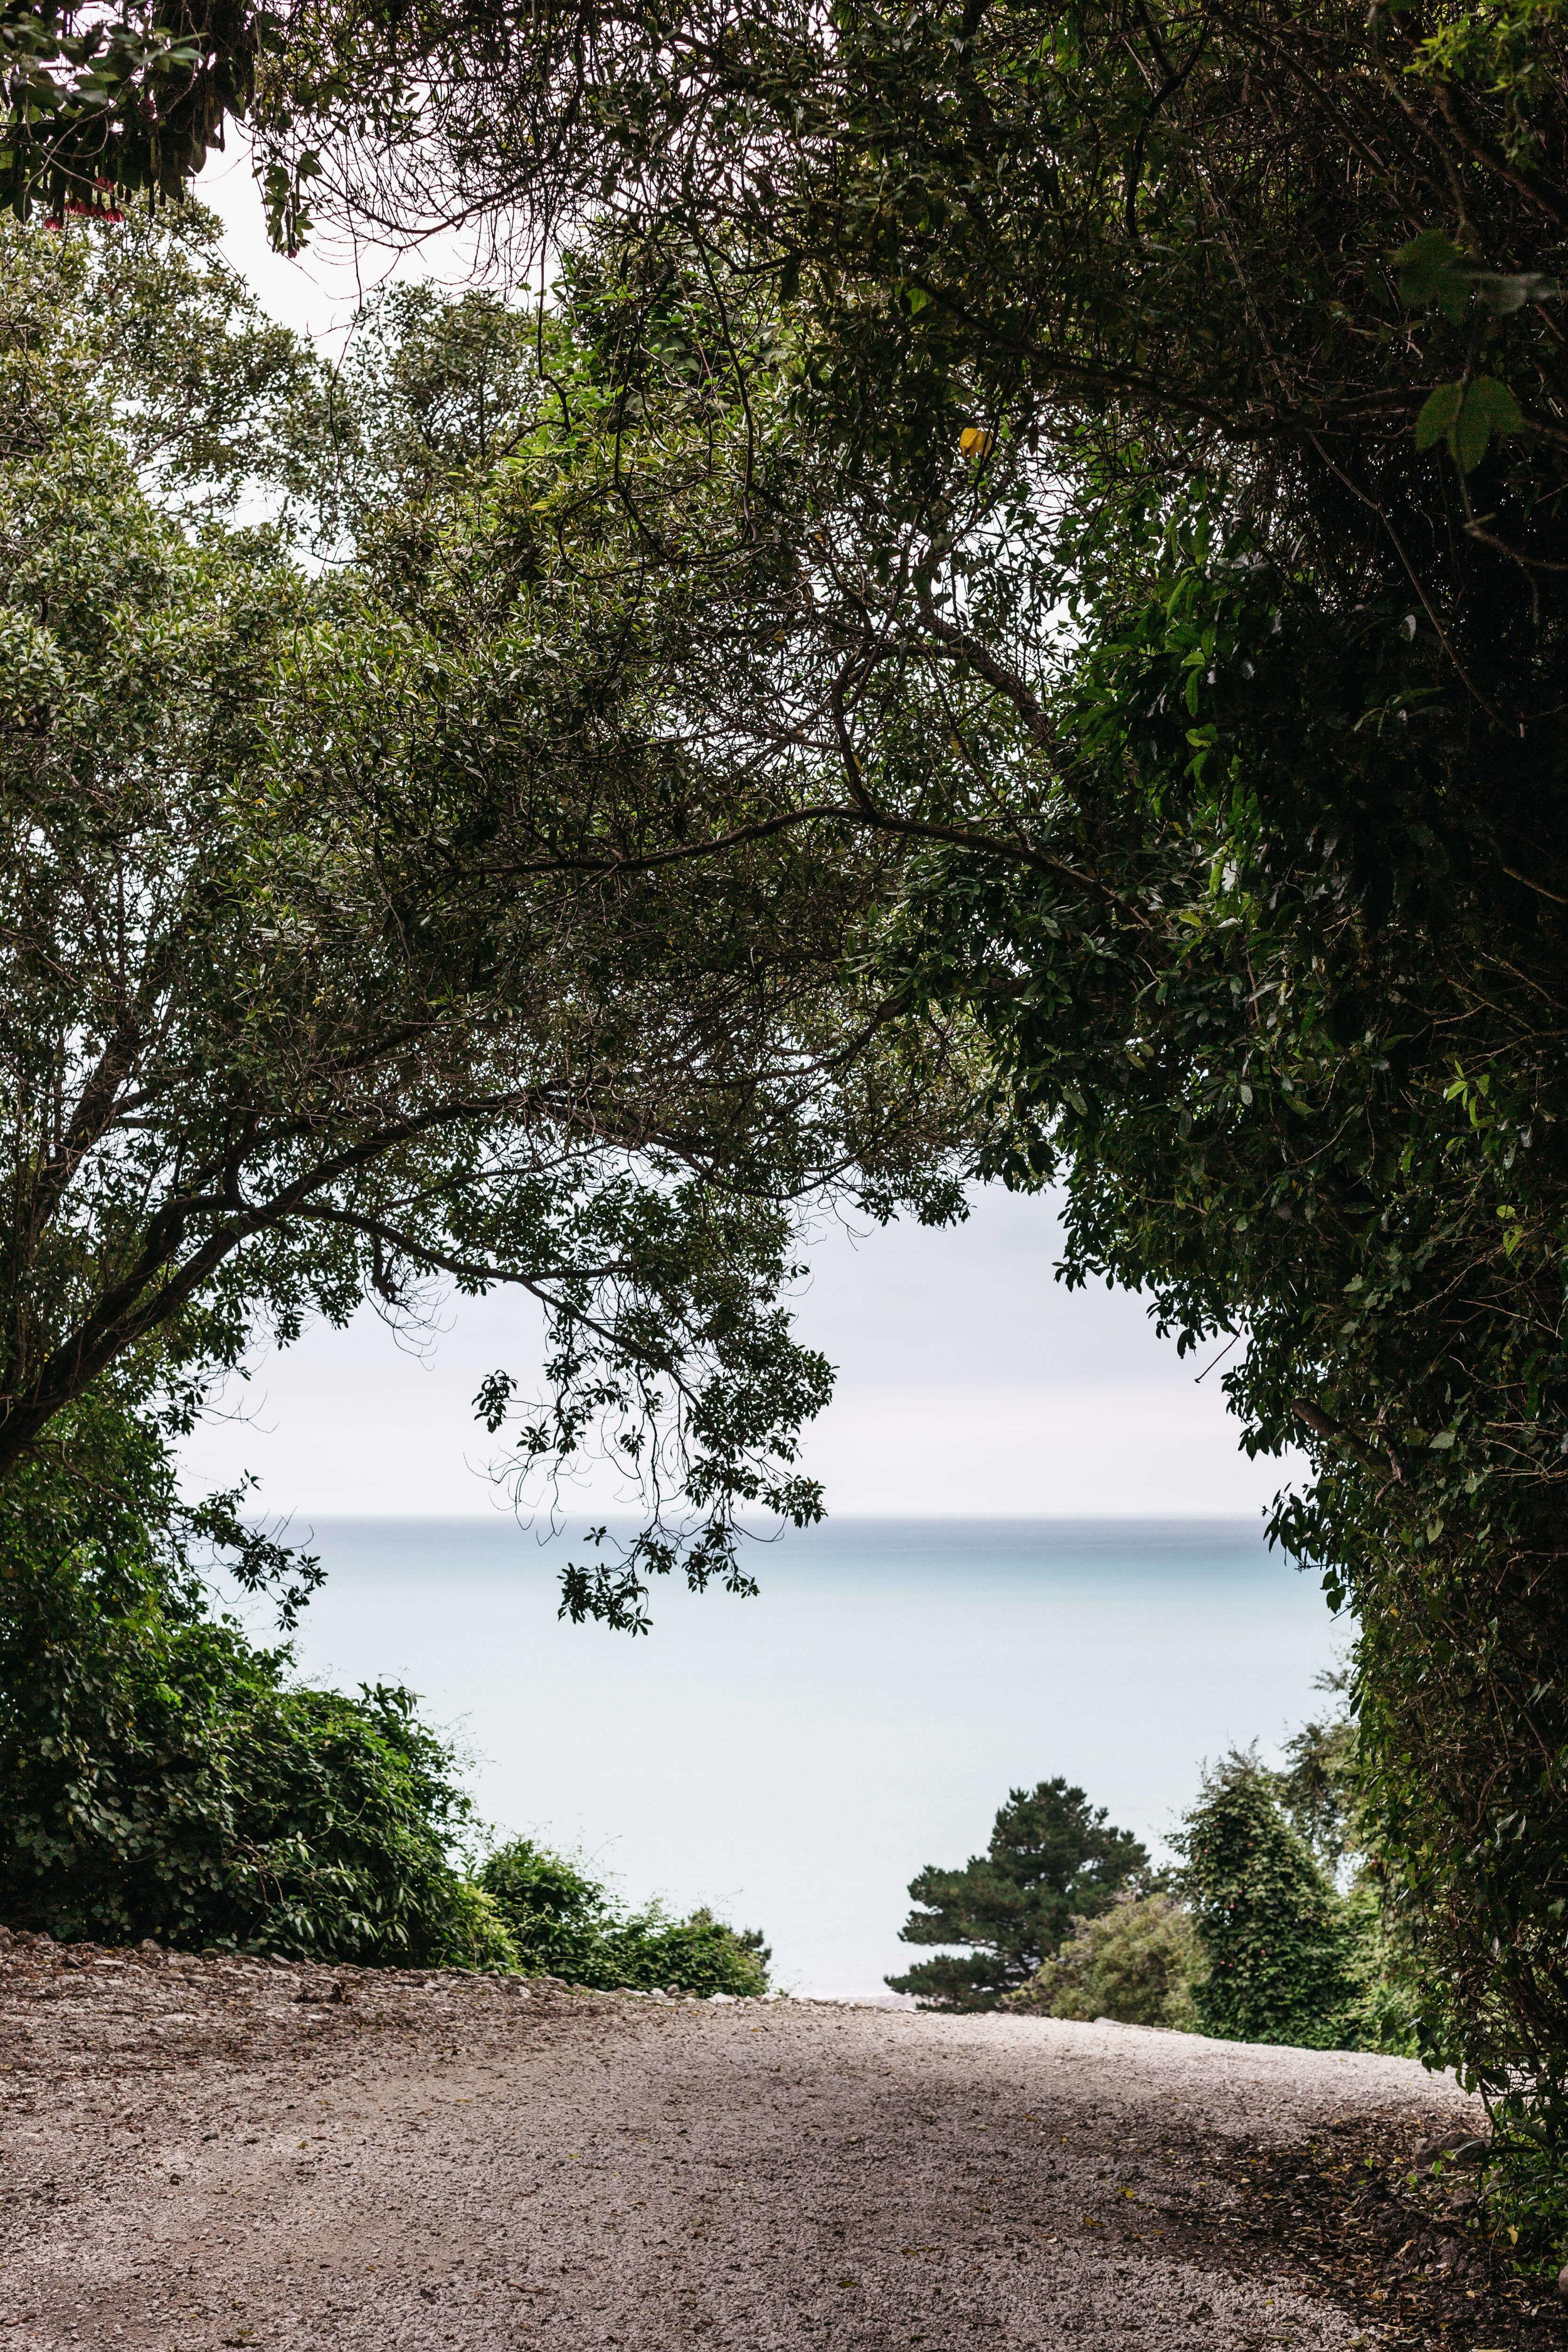 Kate McPherson/NZ Life & Leisure